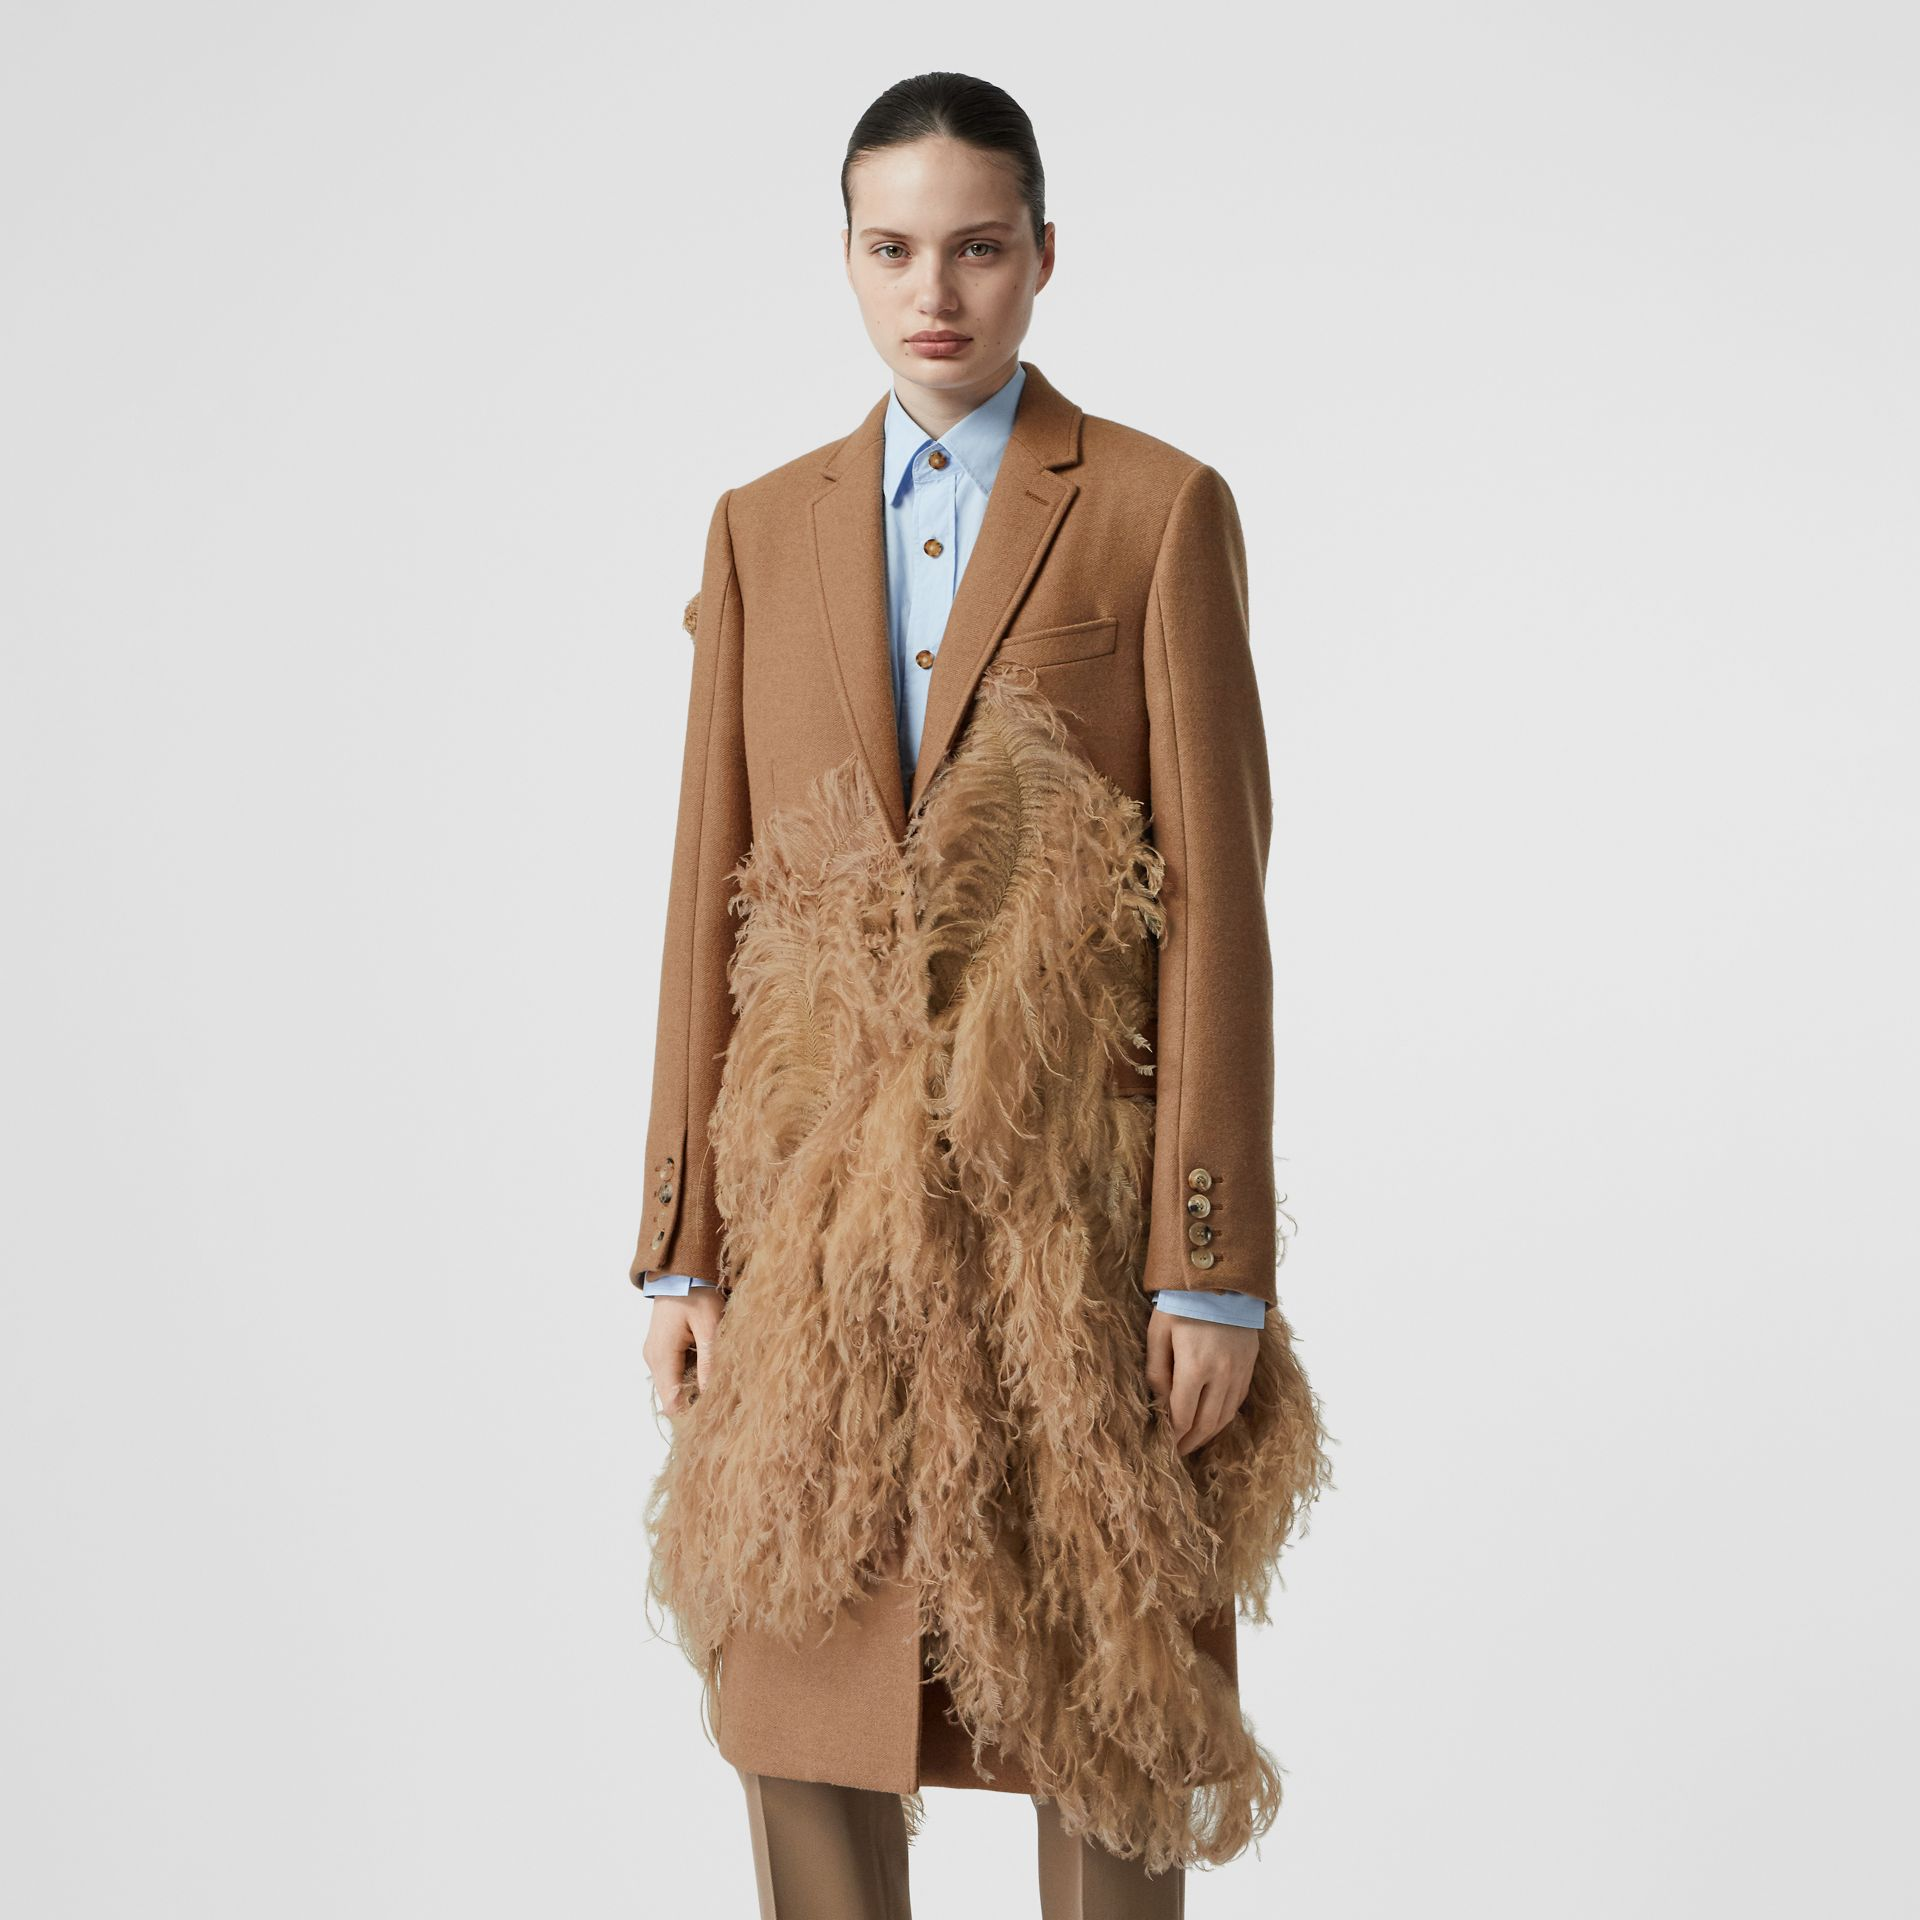 Abrigo de vestir en pelo de camello con detalle de plumas (Cámel) - Mujer | Burberry - imagen de la galería 6